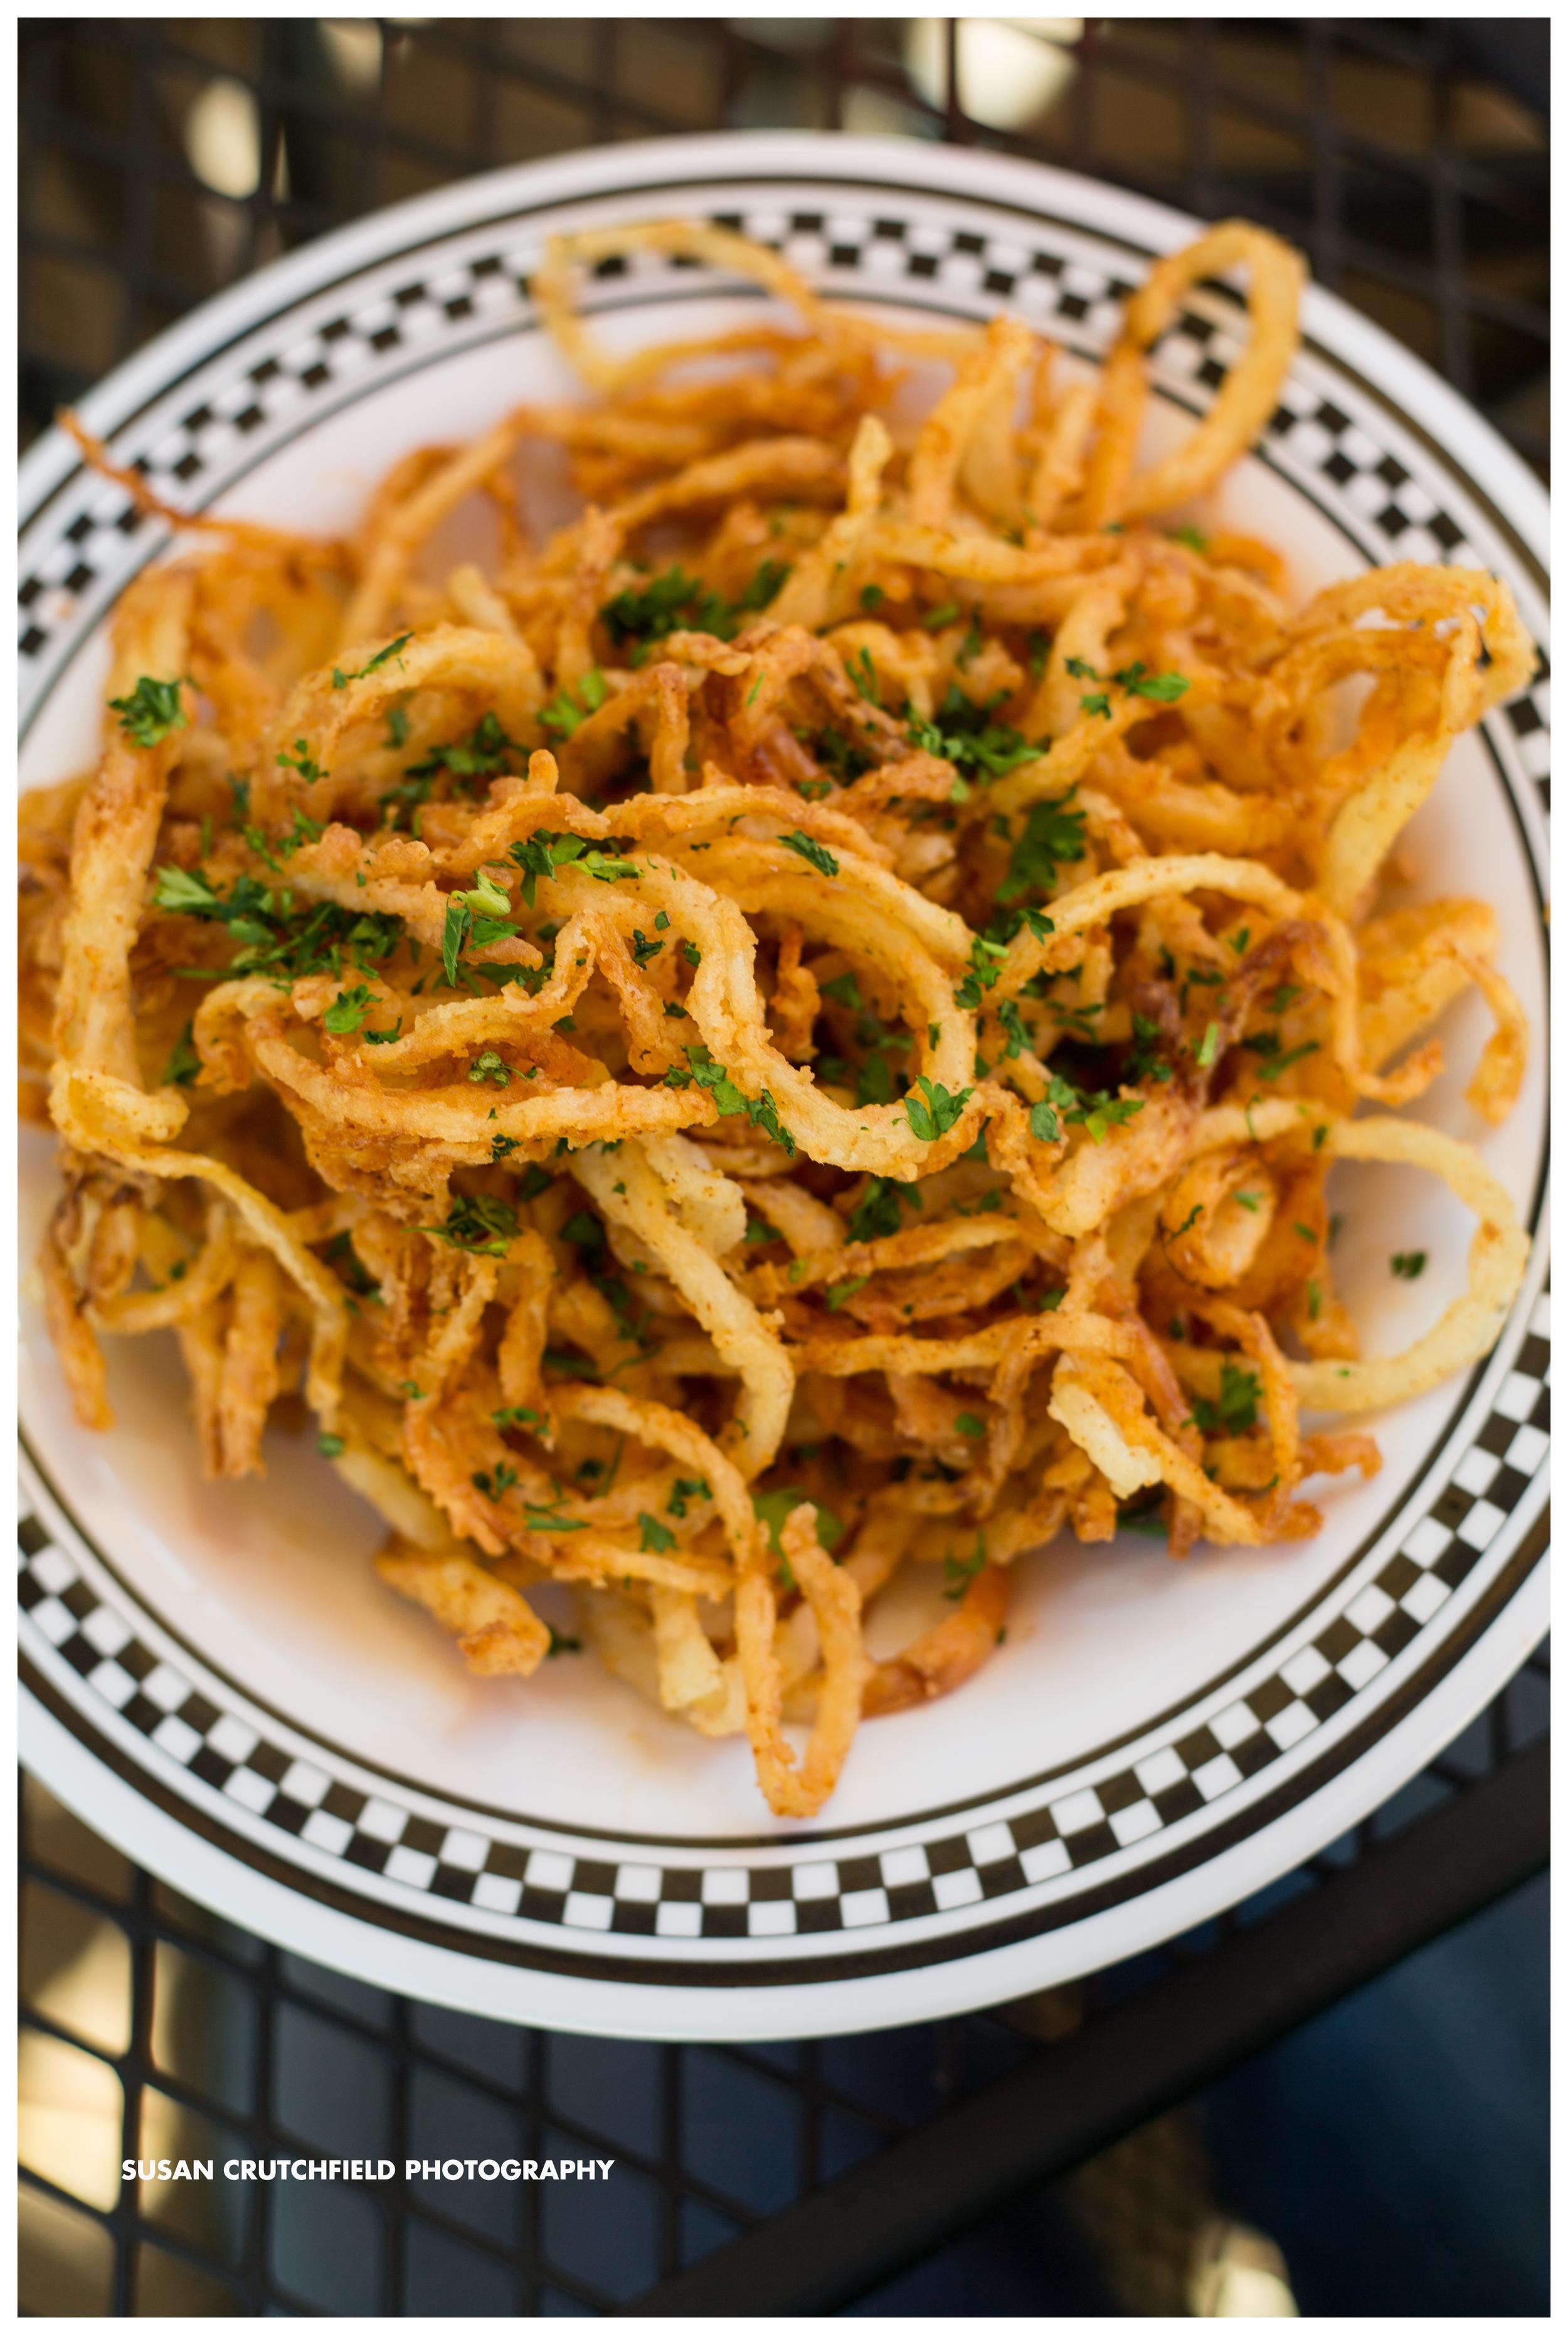 Onion Tangles Meat N Greet Newnan, GA